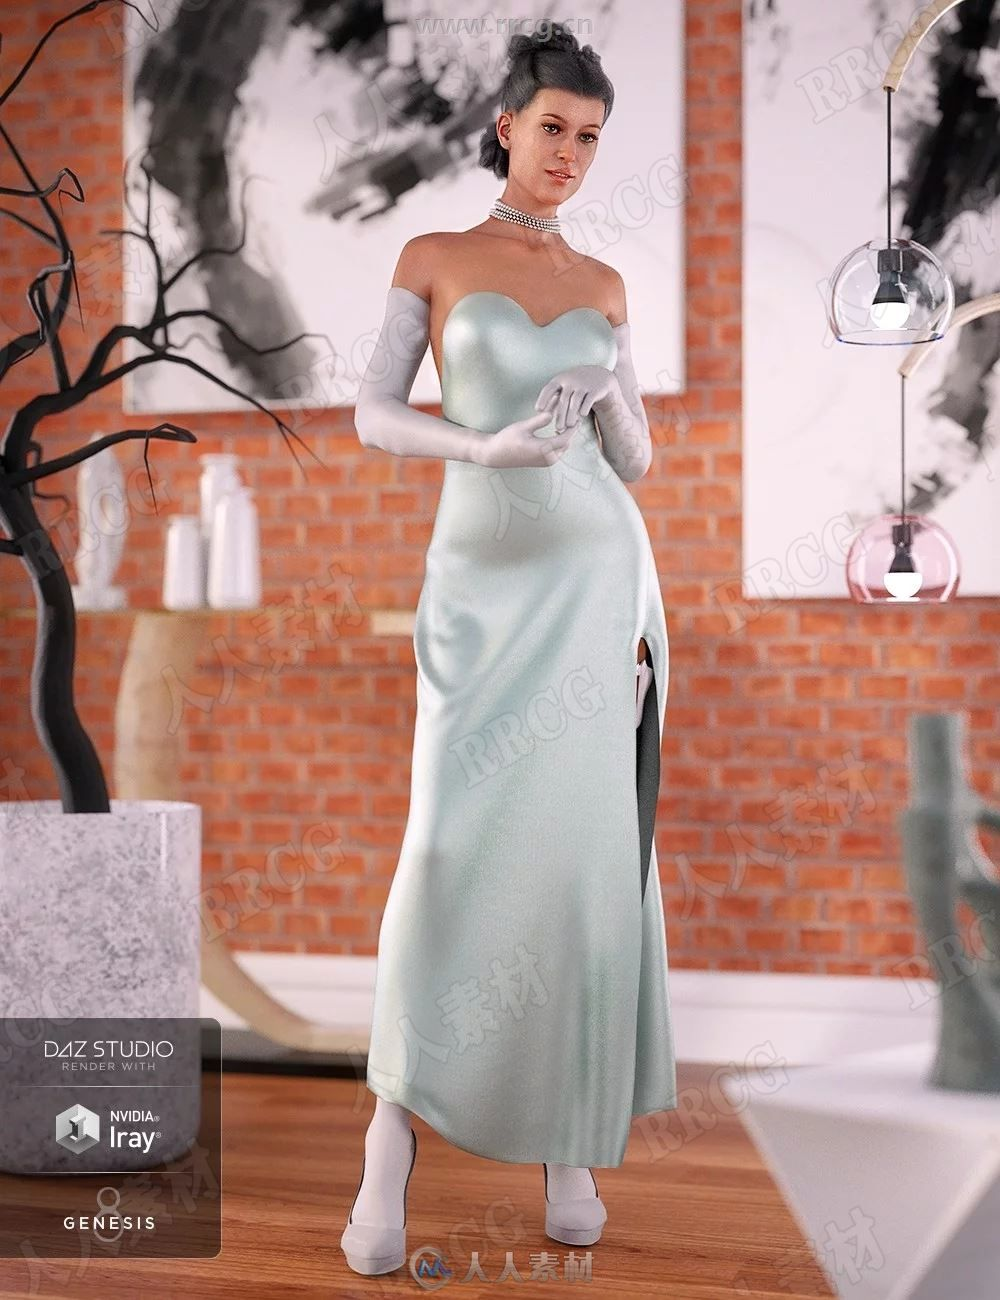 Josephene 8 Pro惊艳魅力女性角色3D模型合集